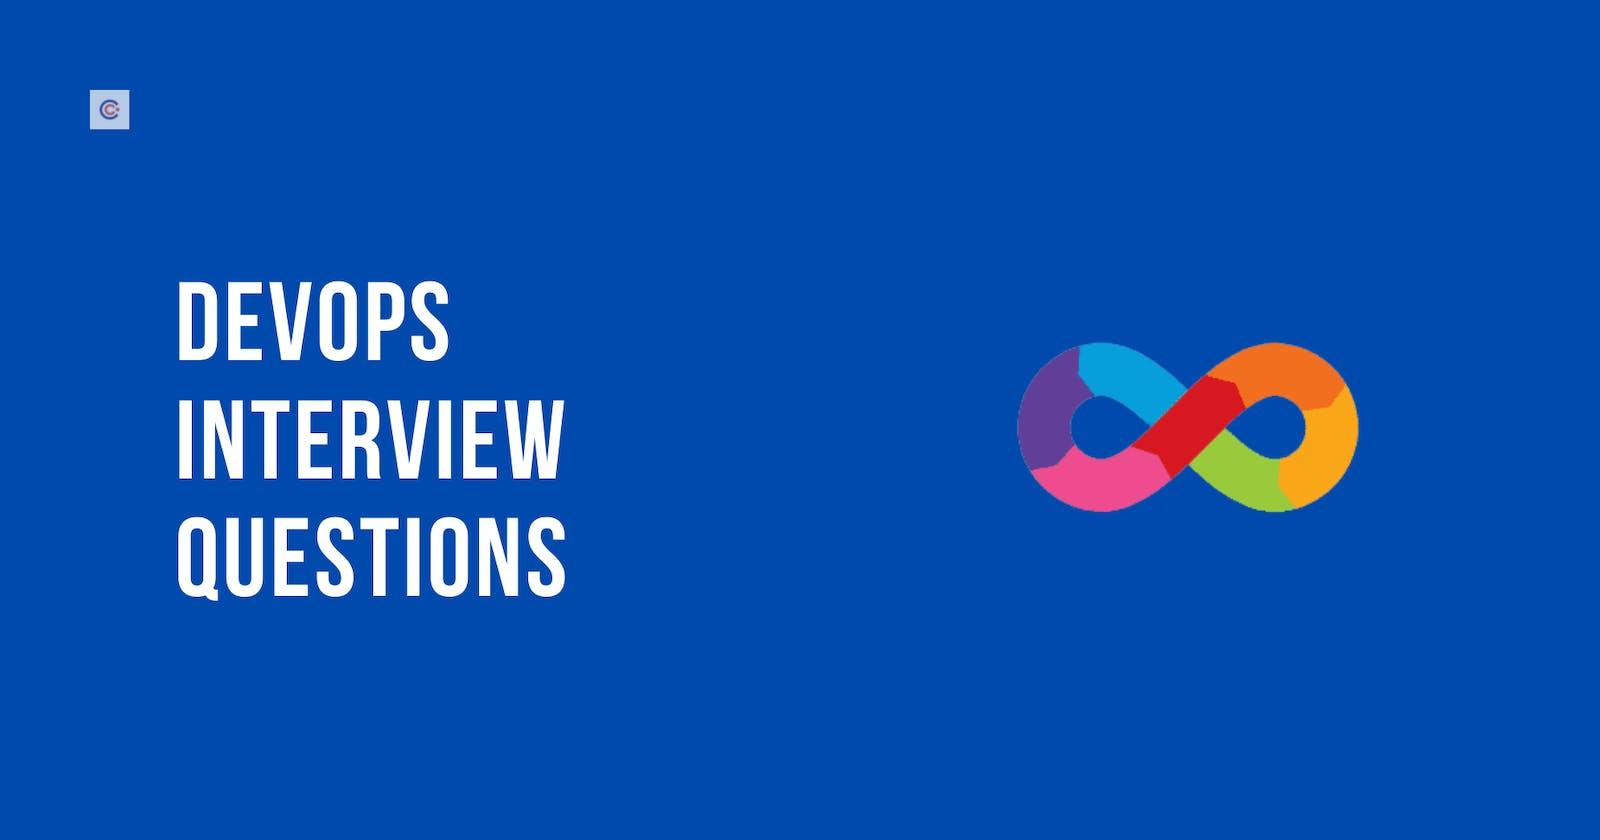 50 Best DevOps Interview Questions To Prepare in 2021